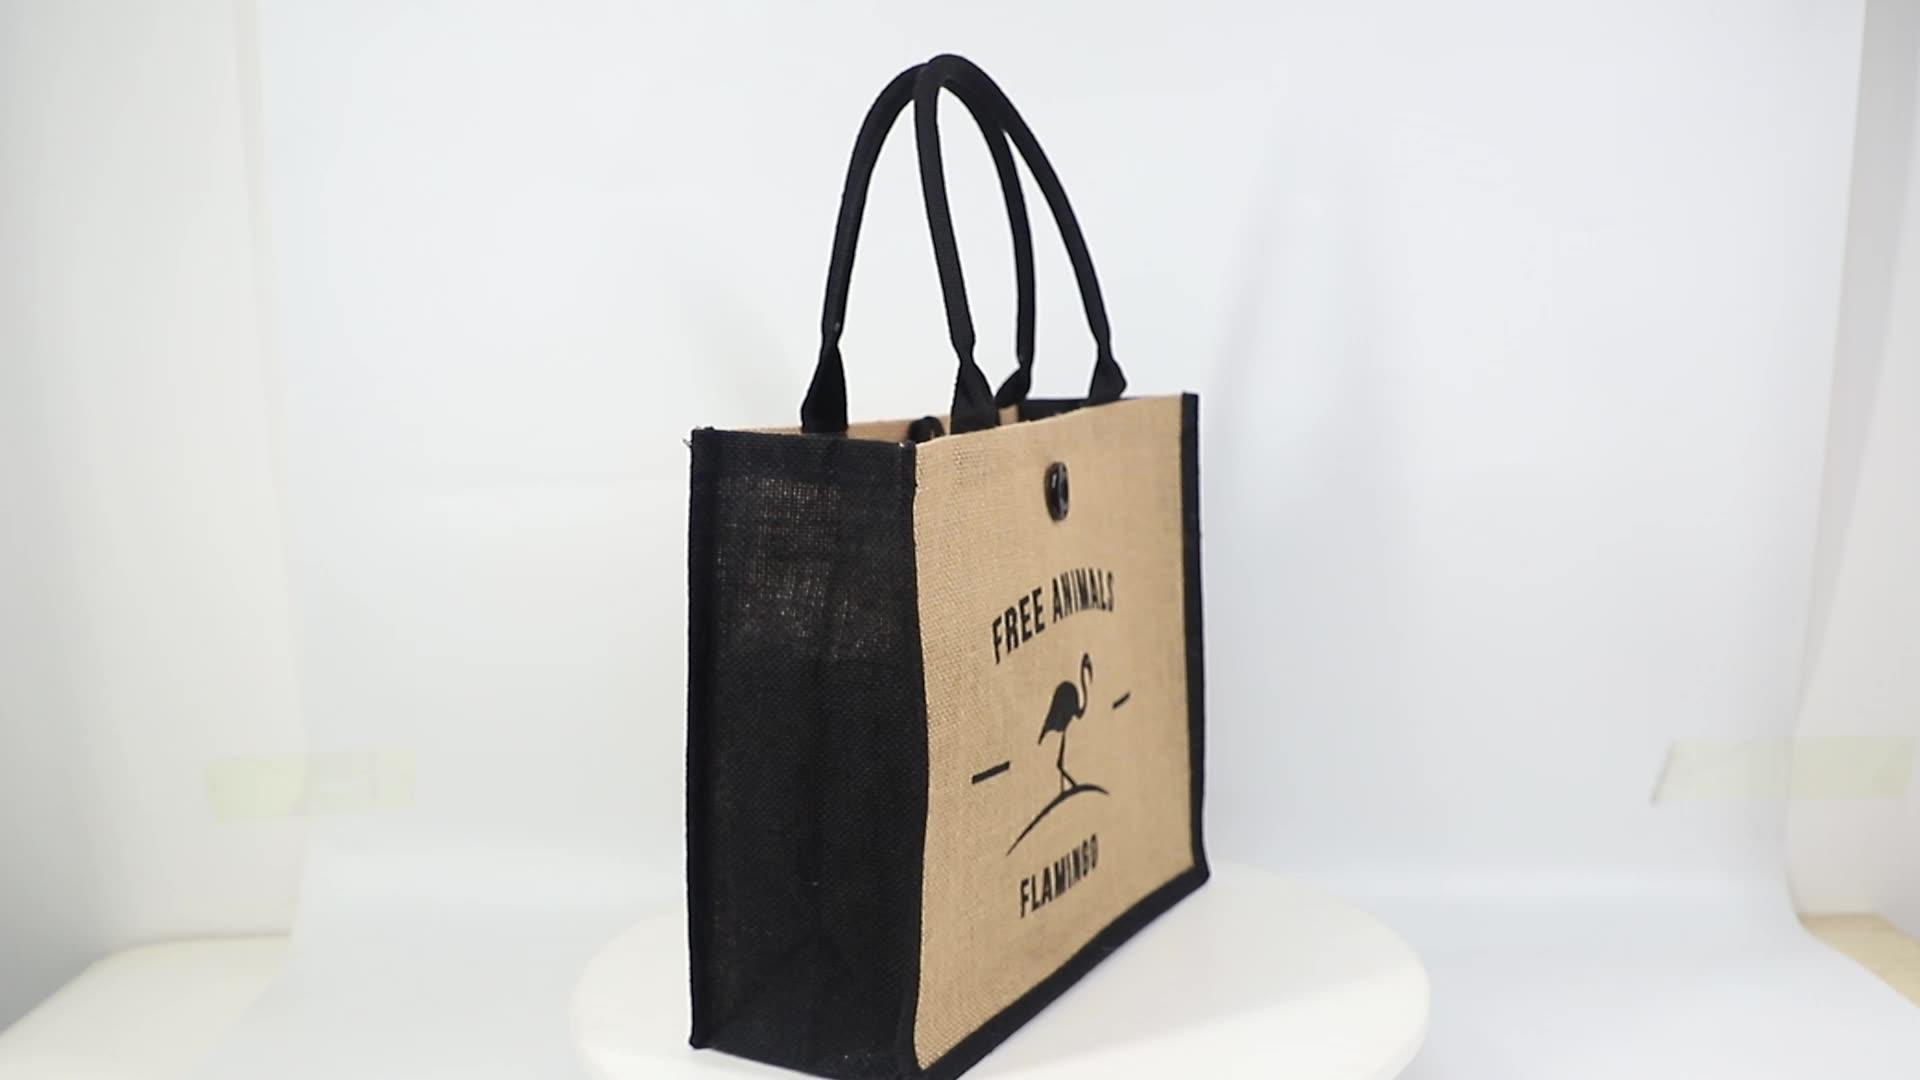 wholesale Eco friendly jute burlap reusable beach bag shopping jute bags with custom logo